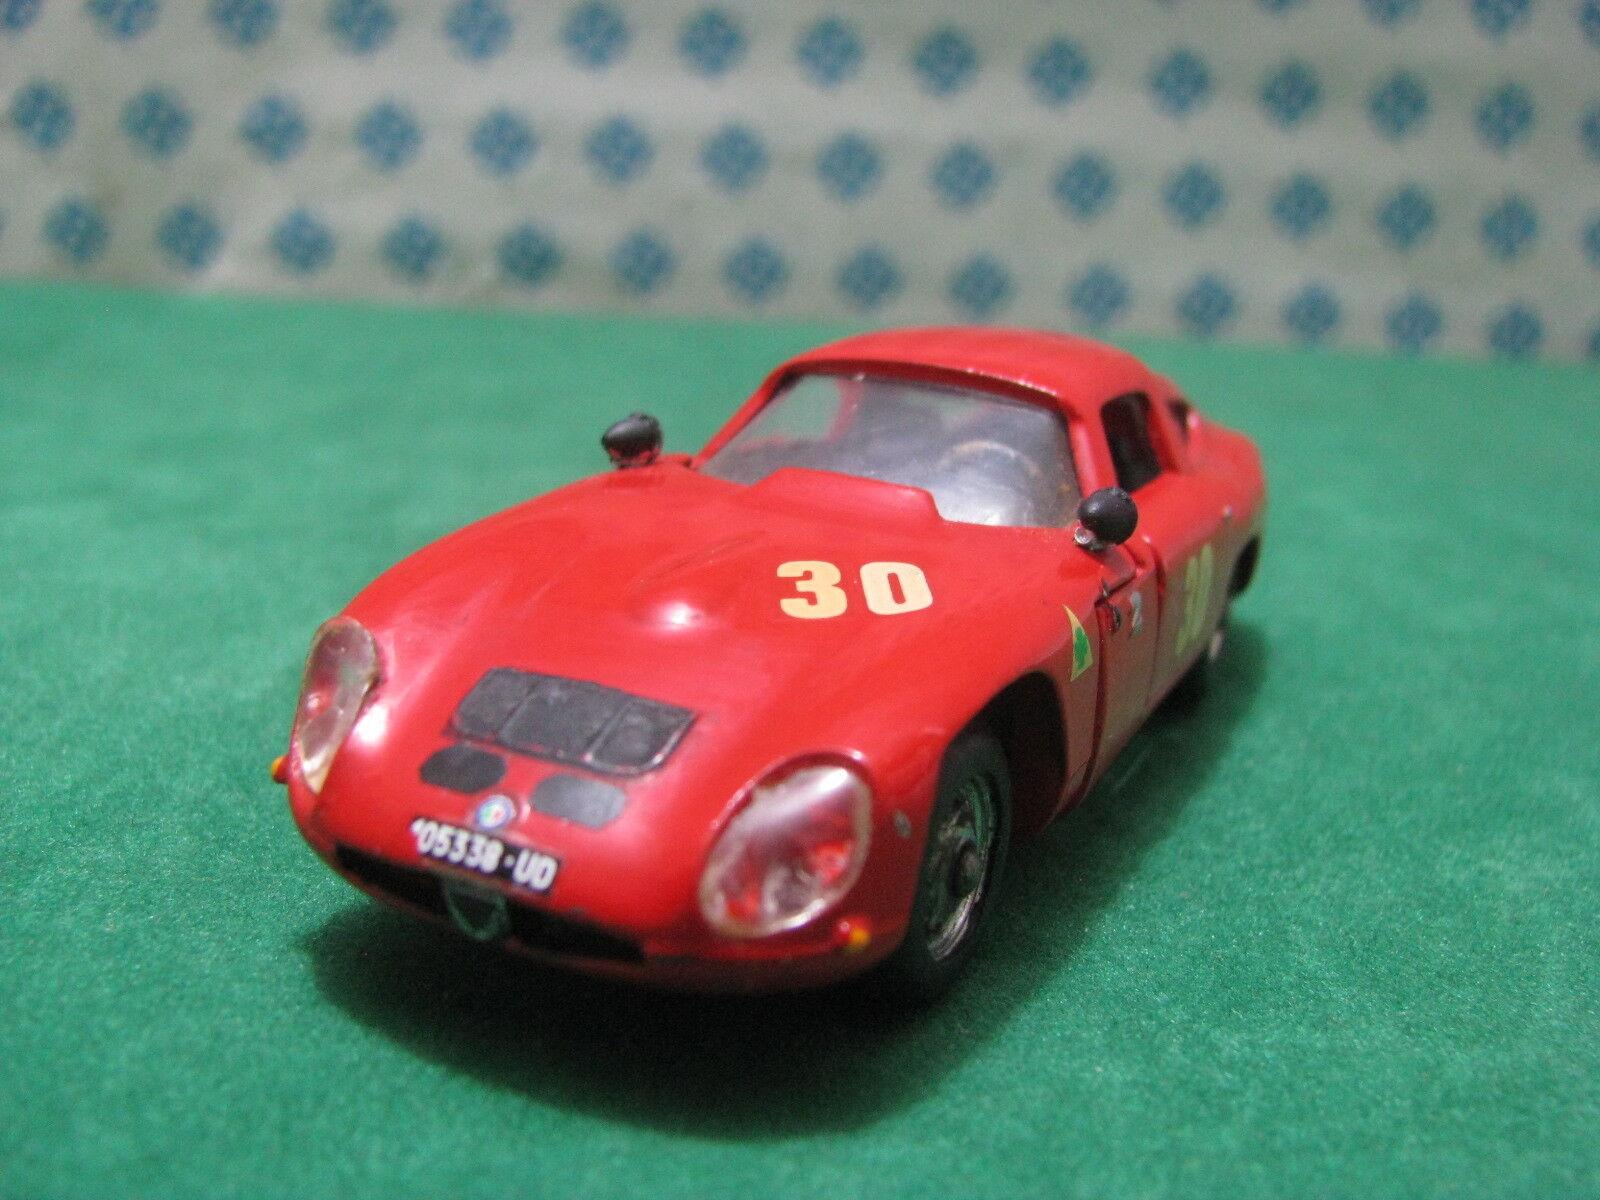 Vintage-Alfa Romeo Giulia tz1 Coupe Le Mans 1963 - 1 43 Politoys-m516